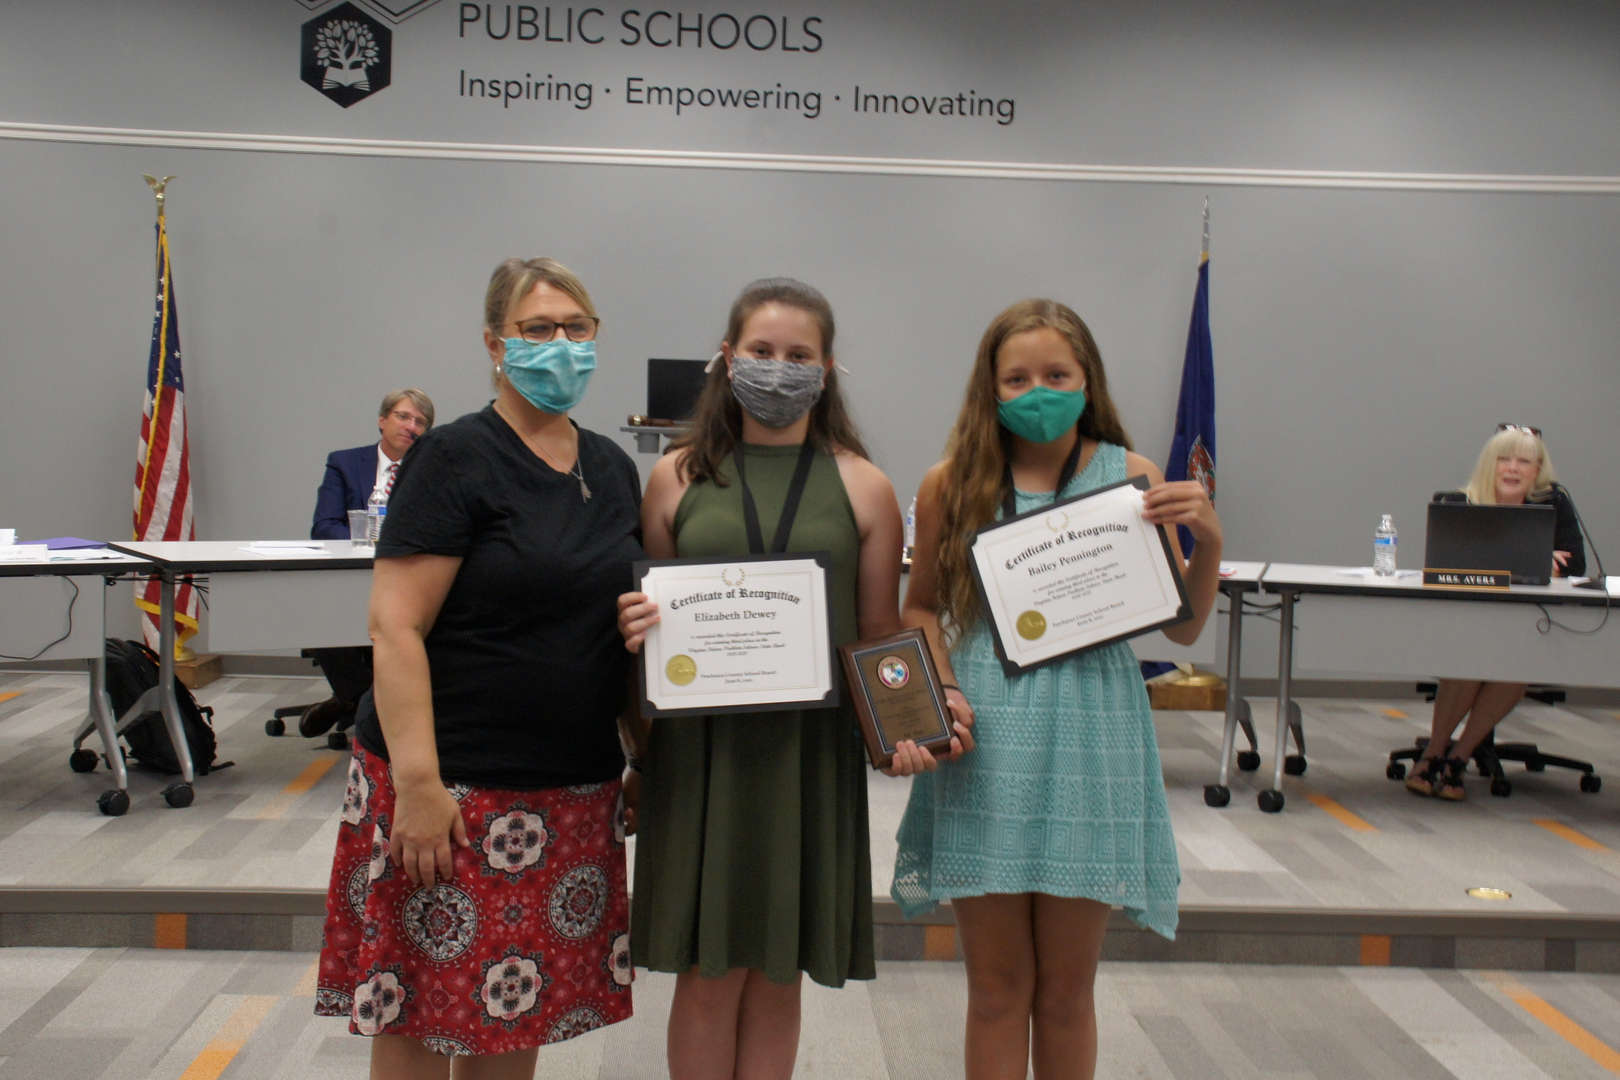 Jeanine Dolan, Elizabeth Dewey, and Bailey Pennington (L-R)